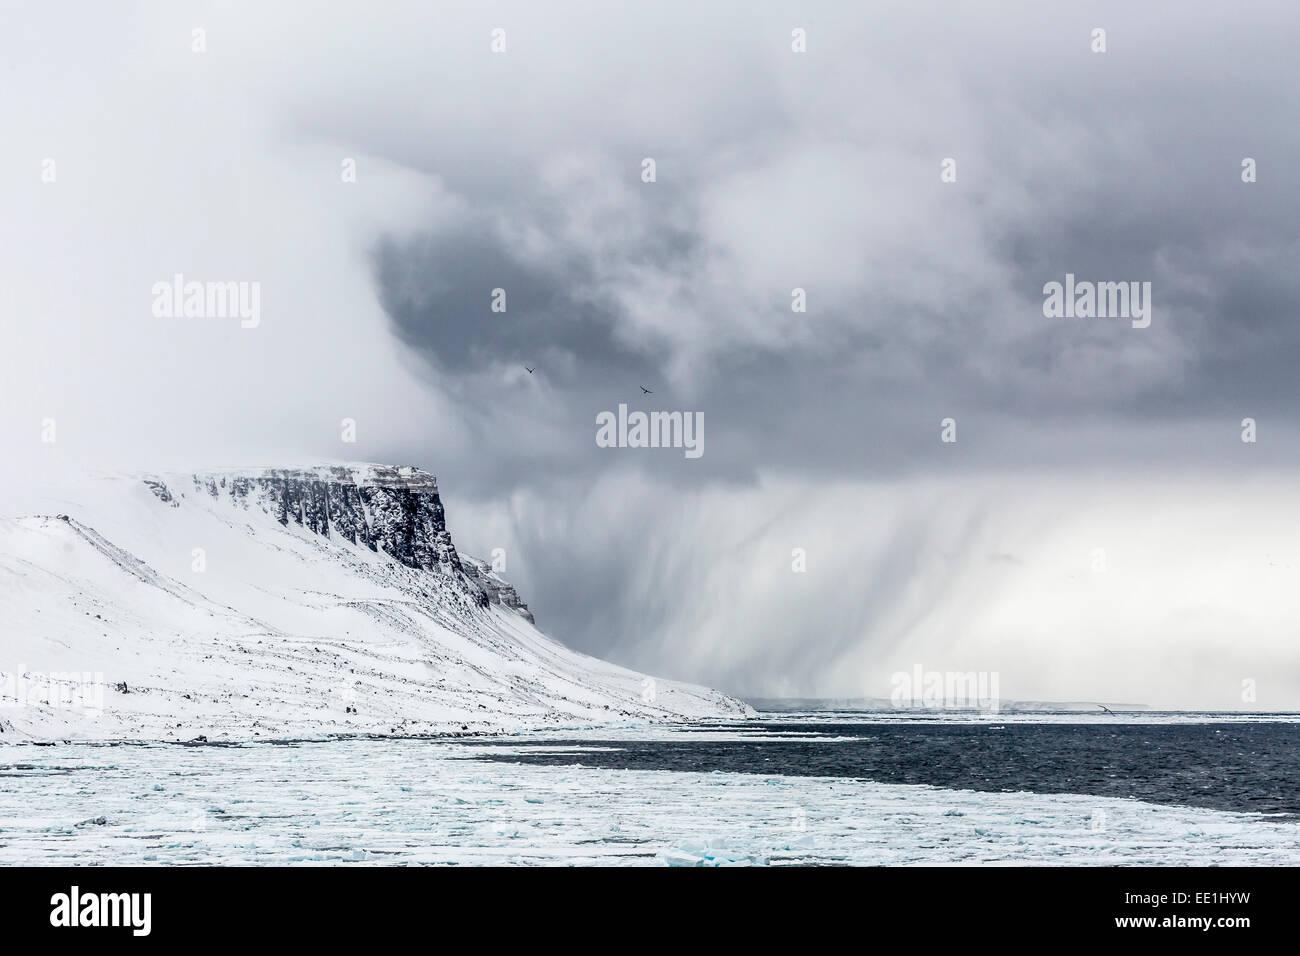 Snow storm approaching Alkefjelet, Cape Fanshawe, Spitsbergen, Svalbard, Arctic, Norway, Scandinavia, Europe - Stock Image